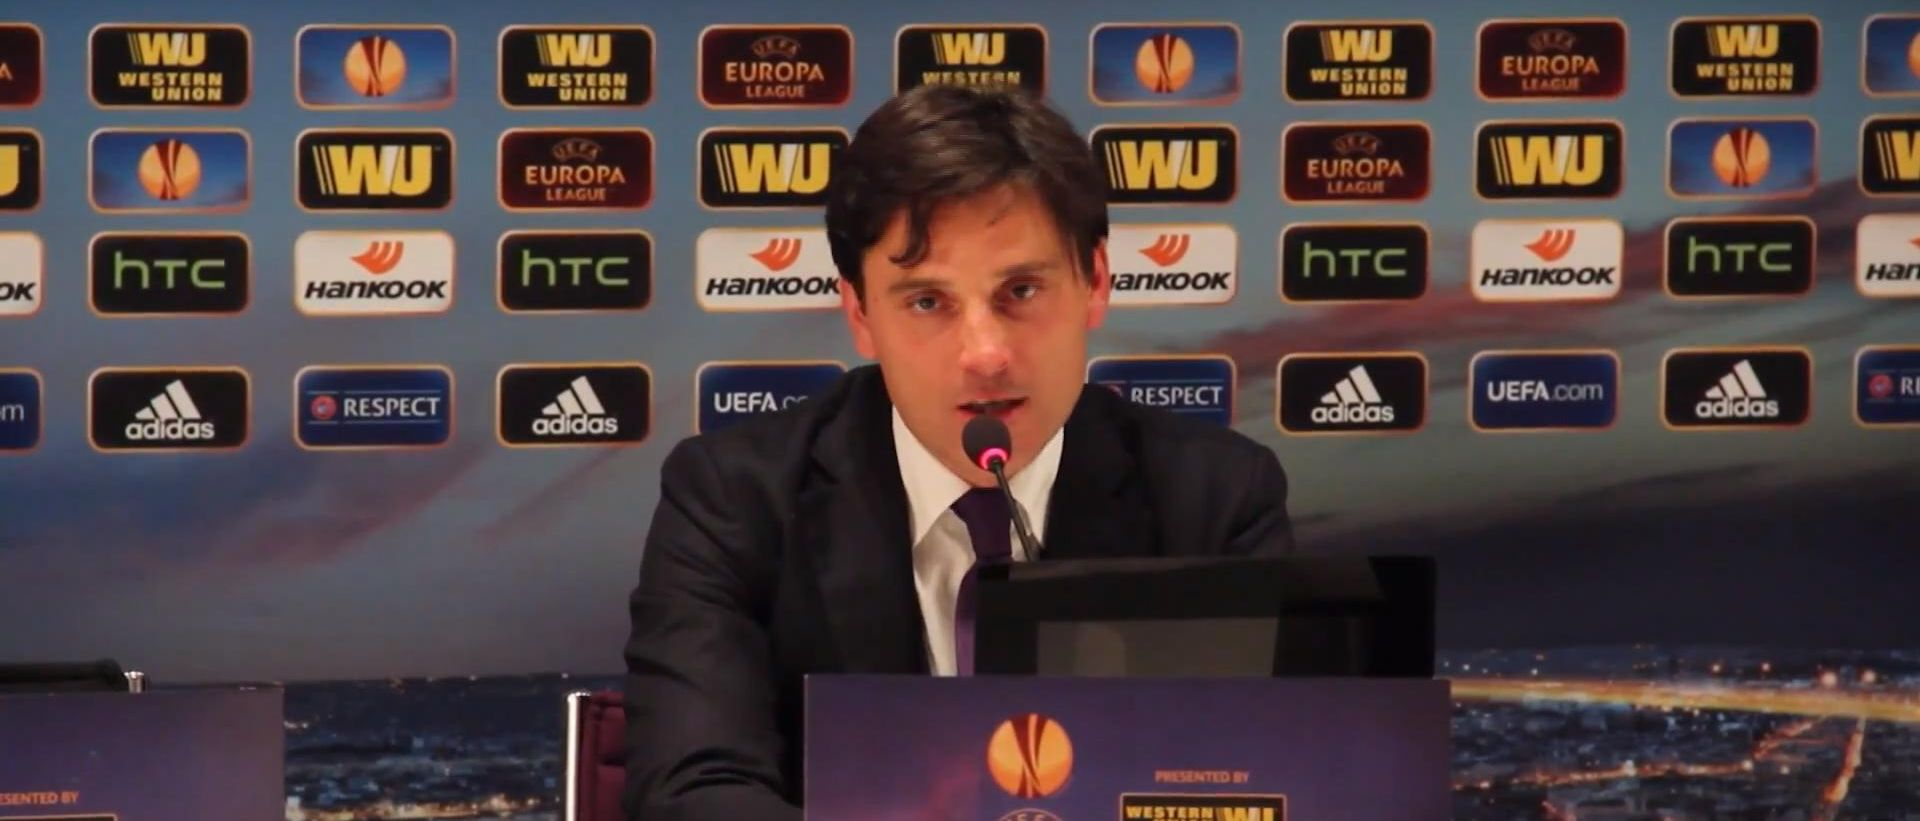 TREĆA GODINA BEZ EUROPE Vincenzo Montella novi trener Milana